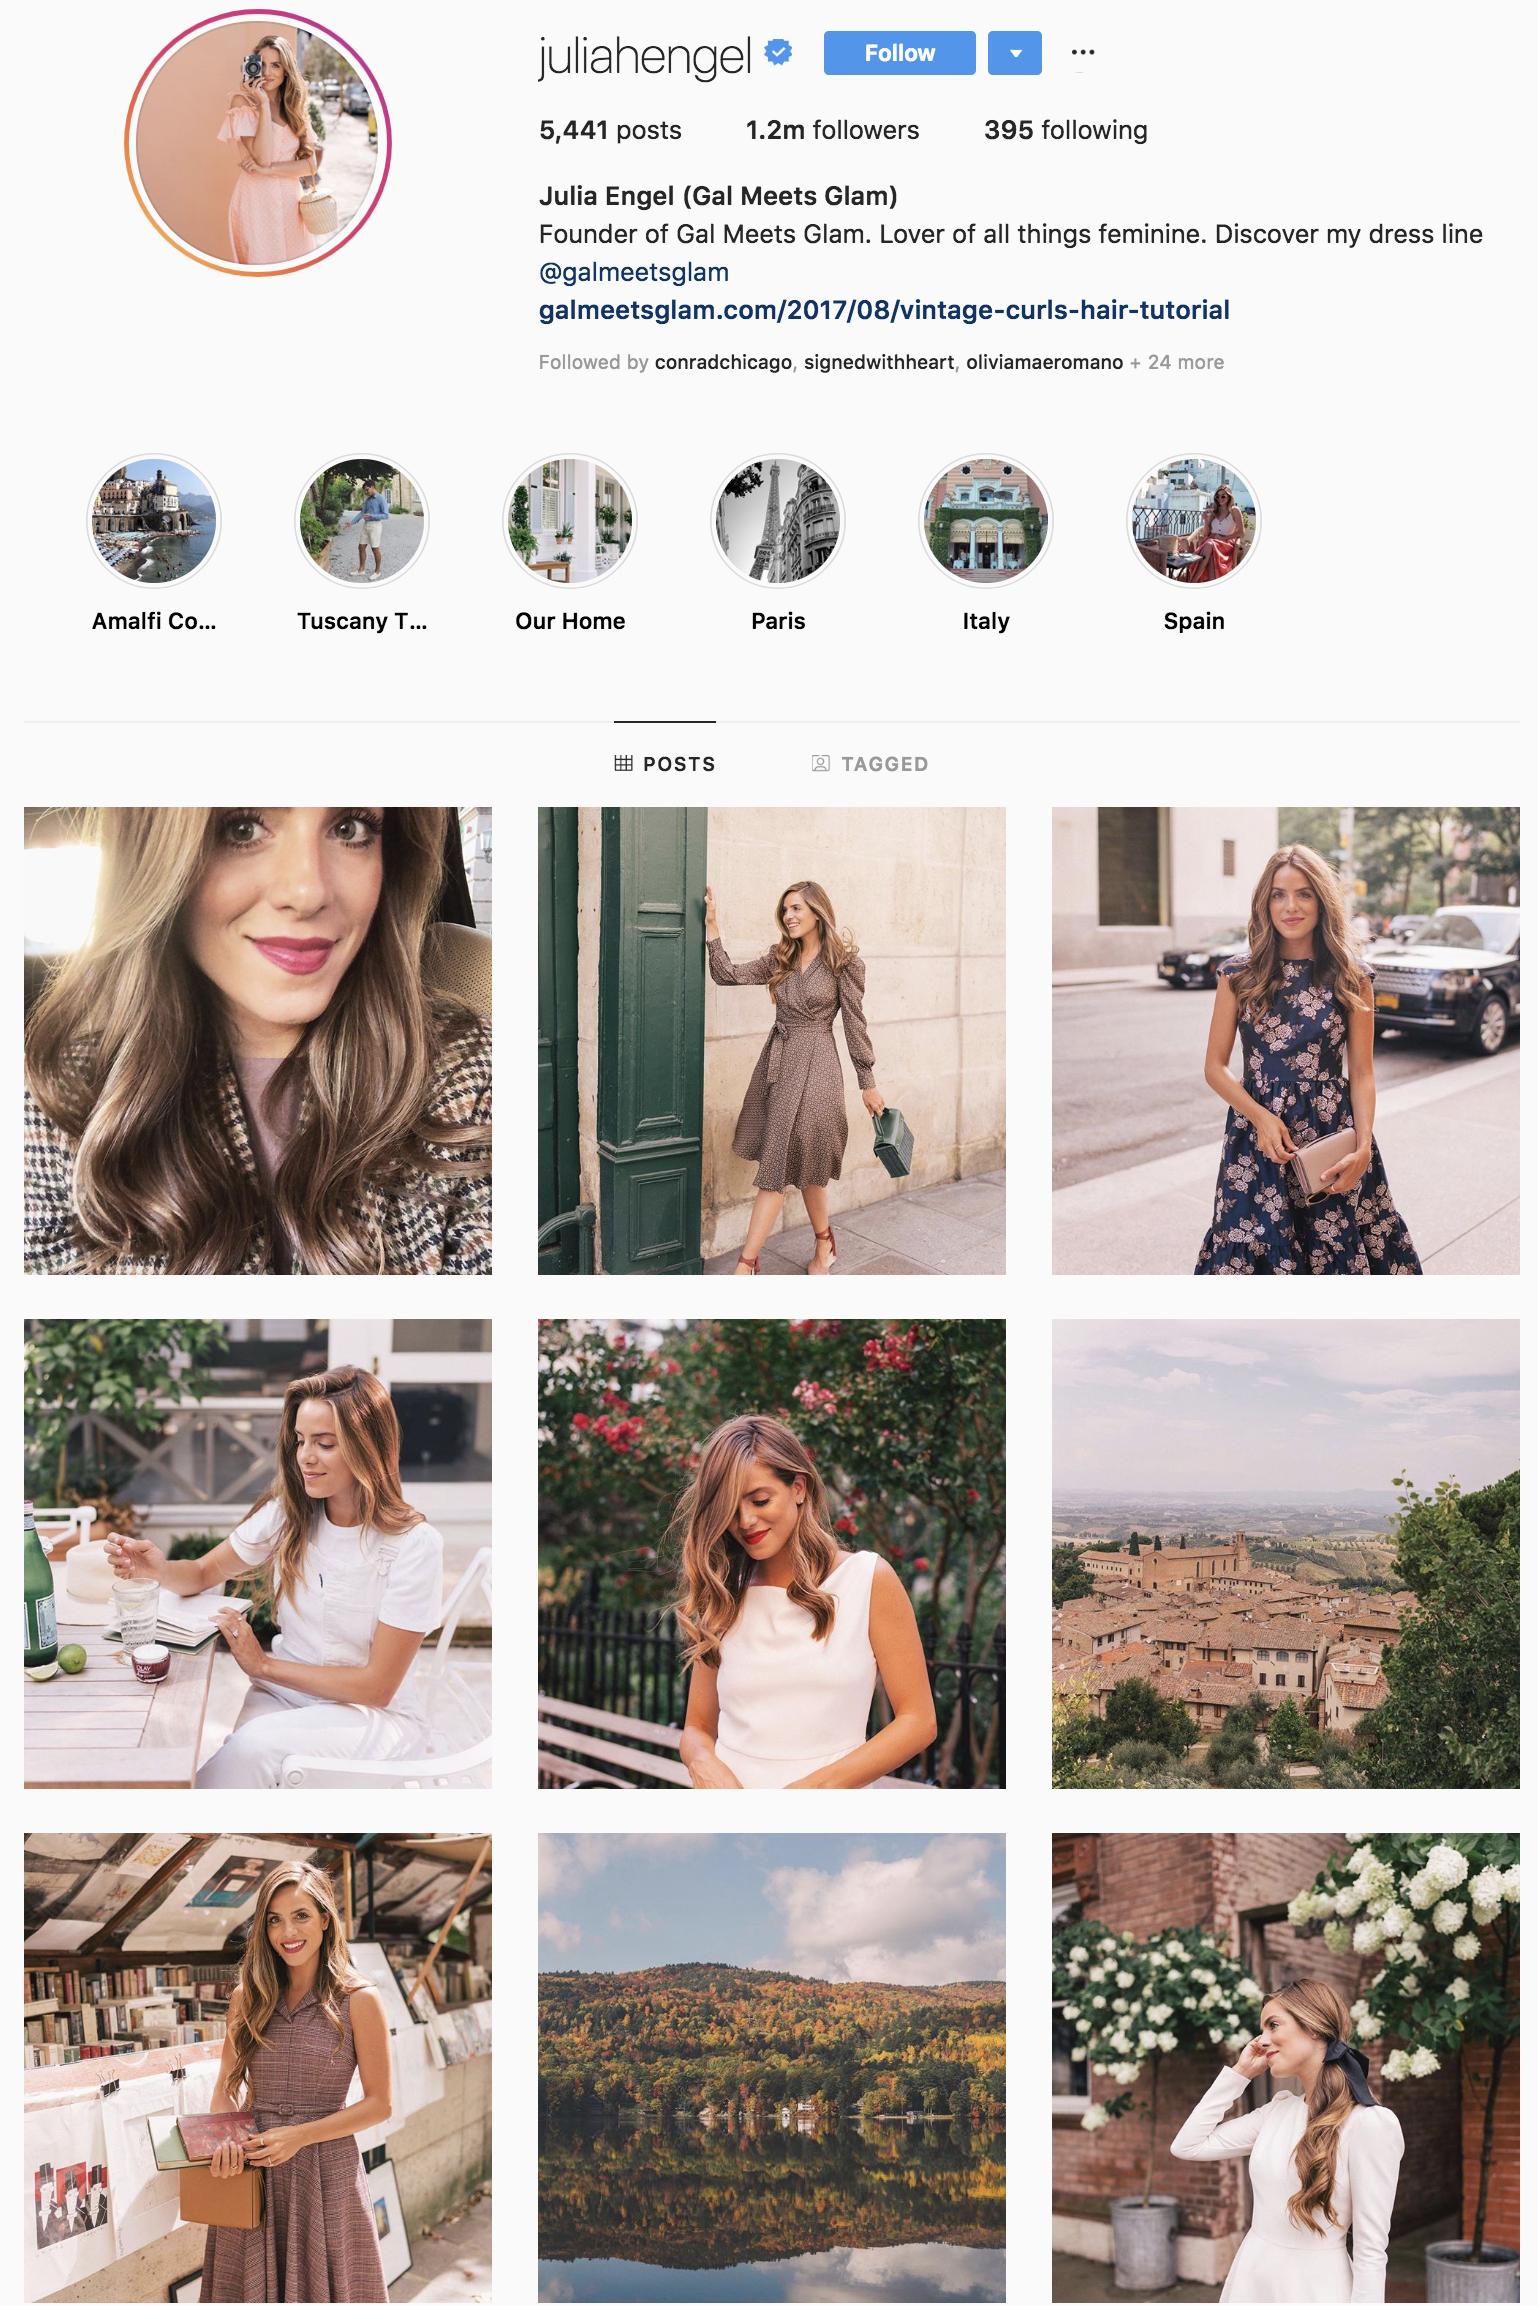 julia-hengel-instagram-influencer-profile